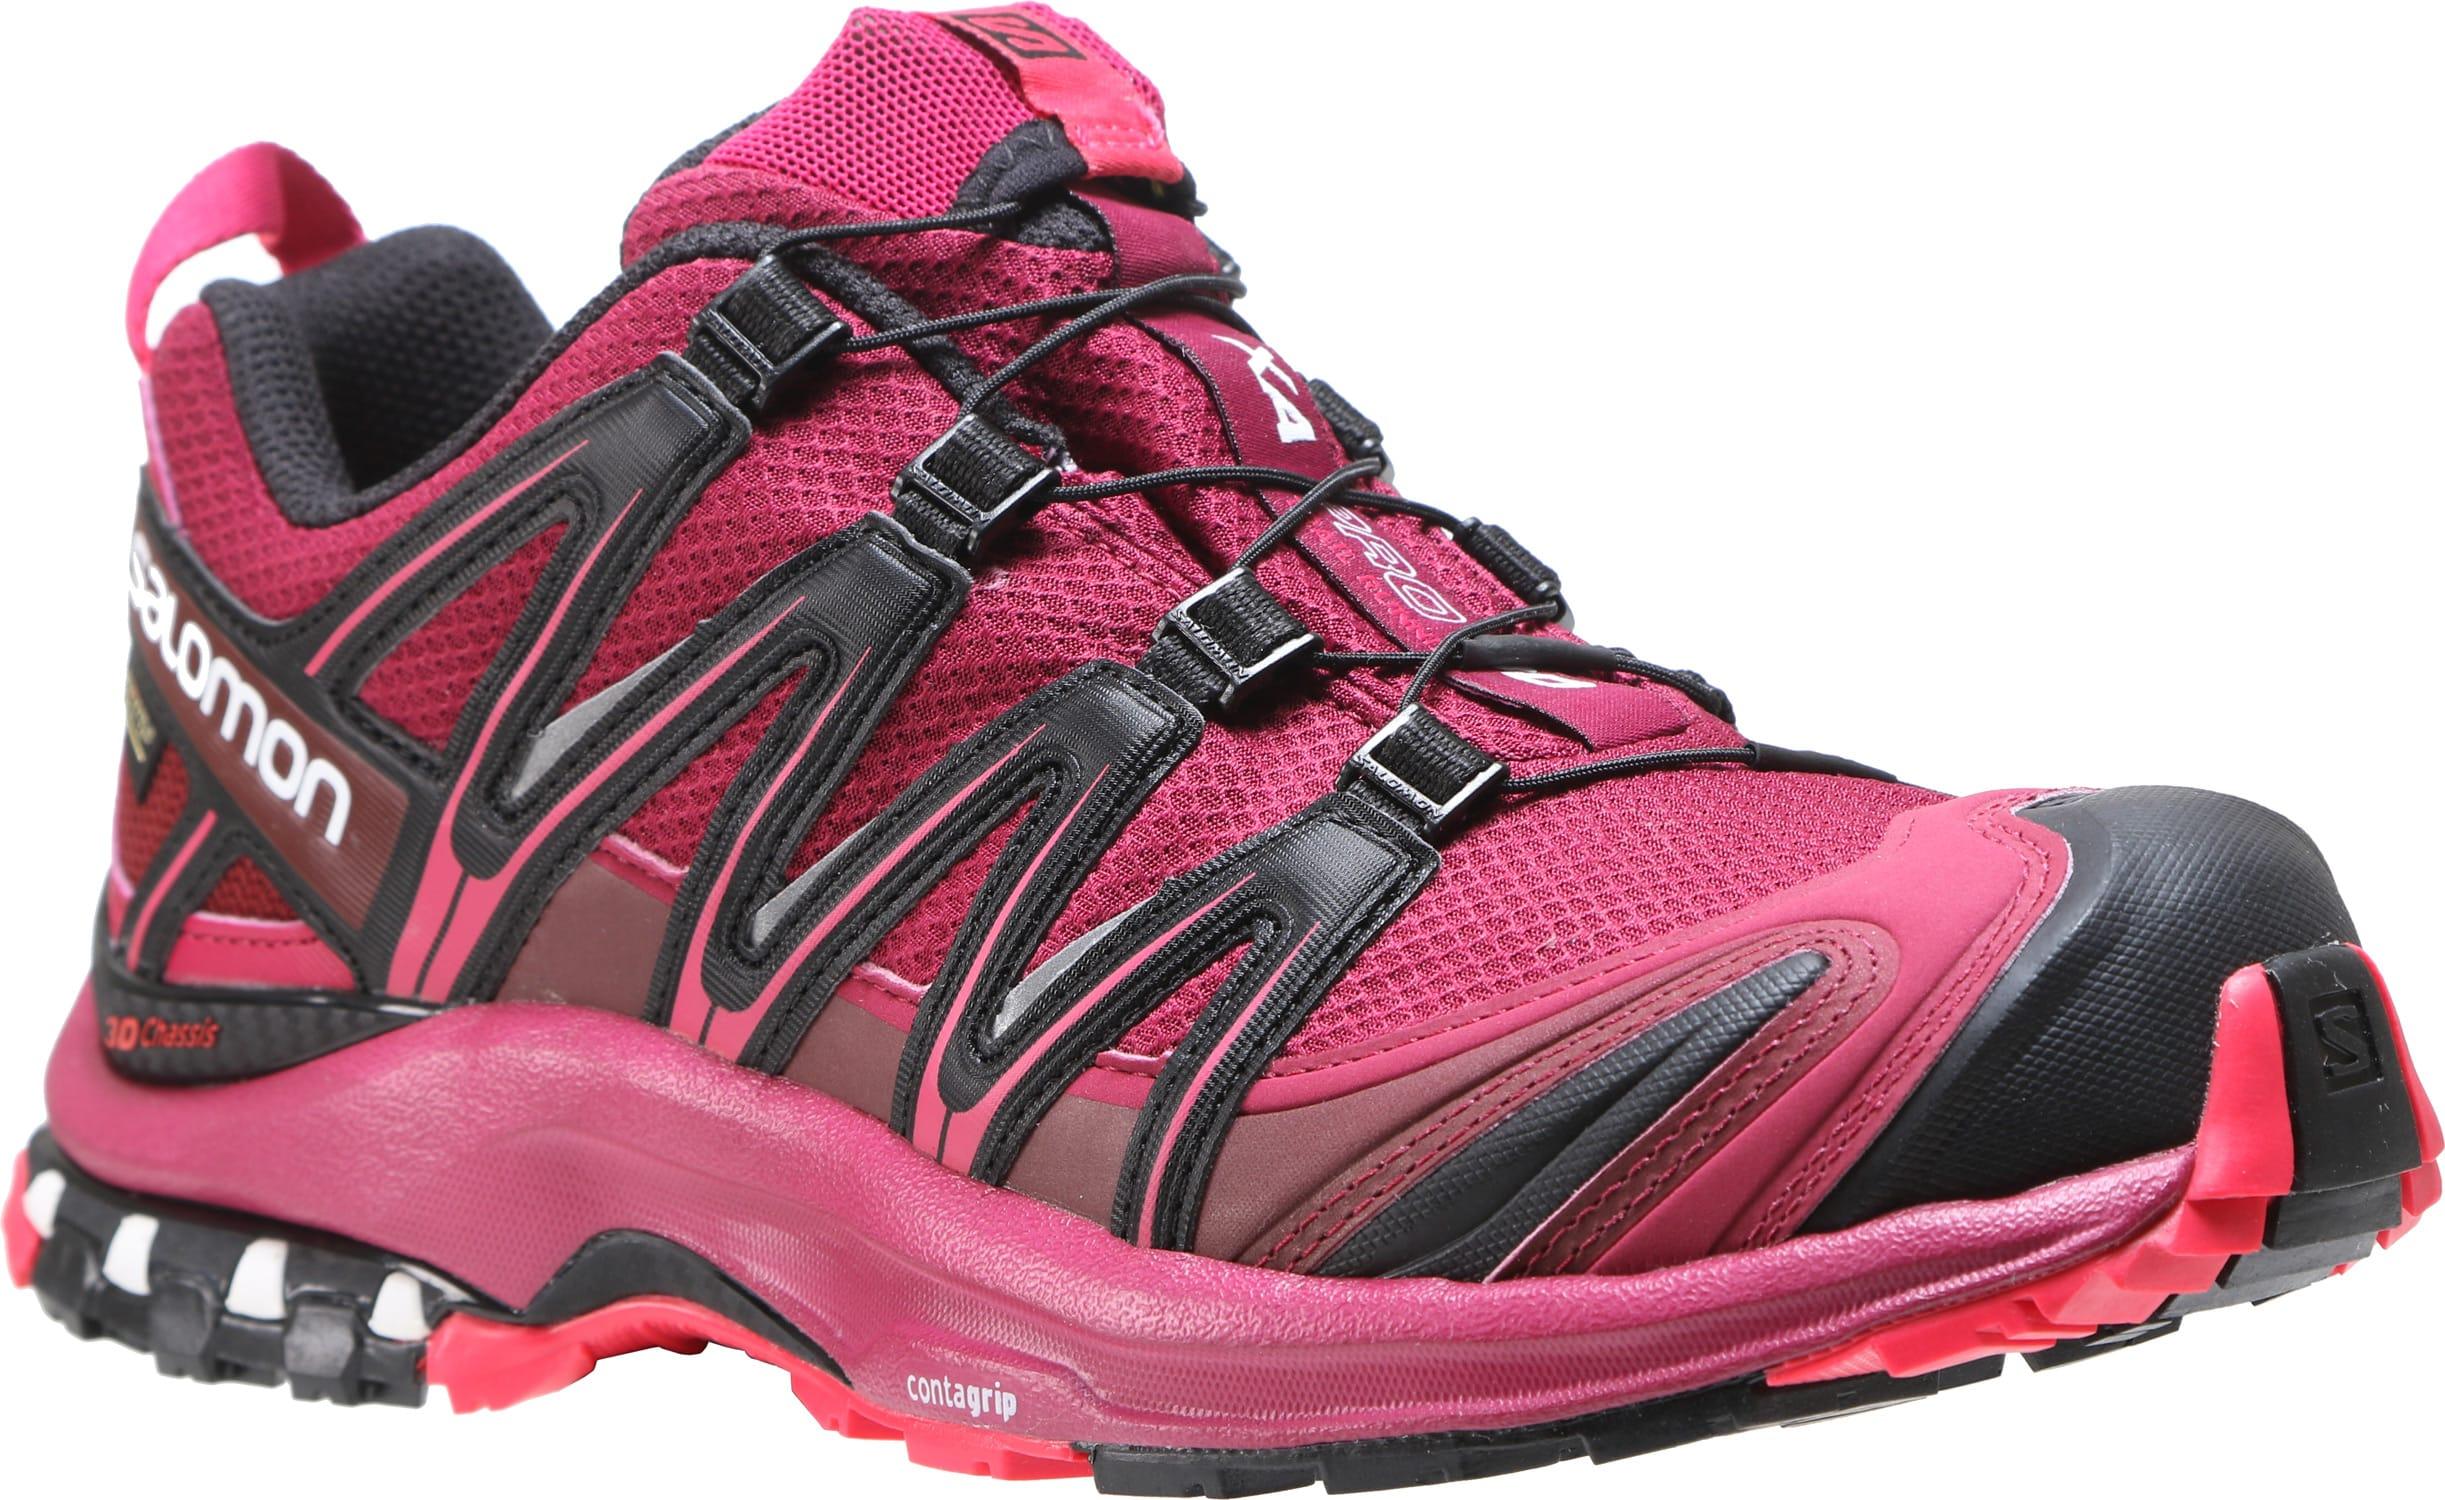 cb917d9e5309 Salomon XA Pro 3D GTX Trail Running Shoes - thumbnail 2